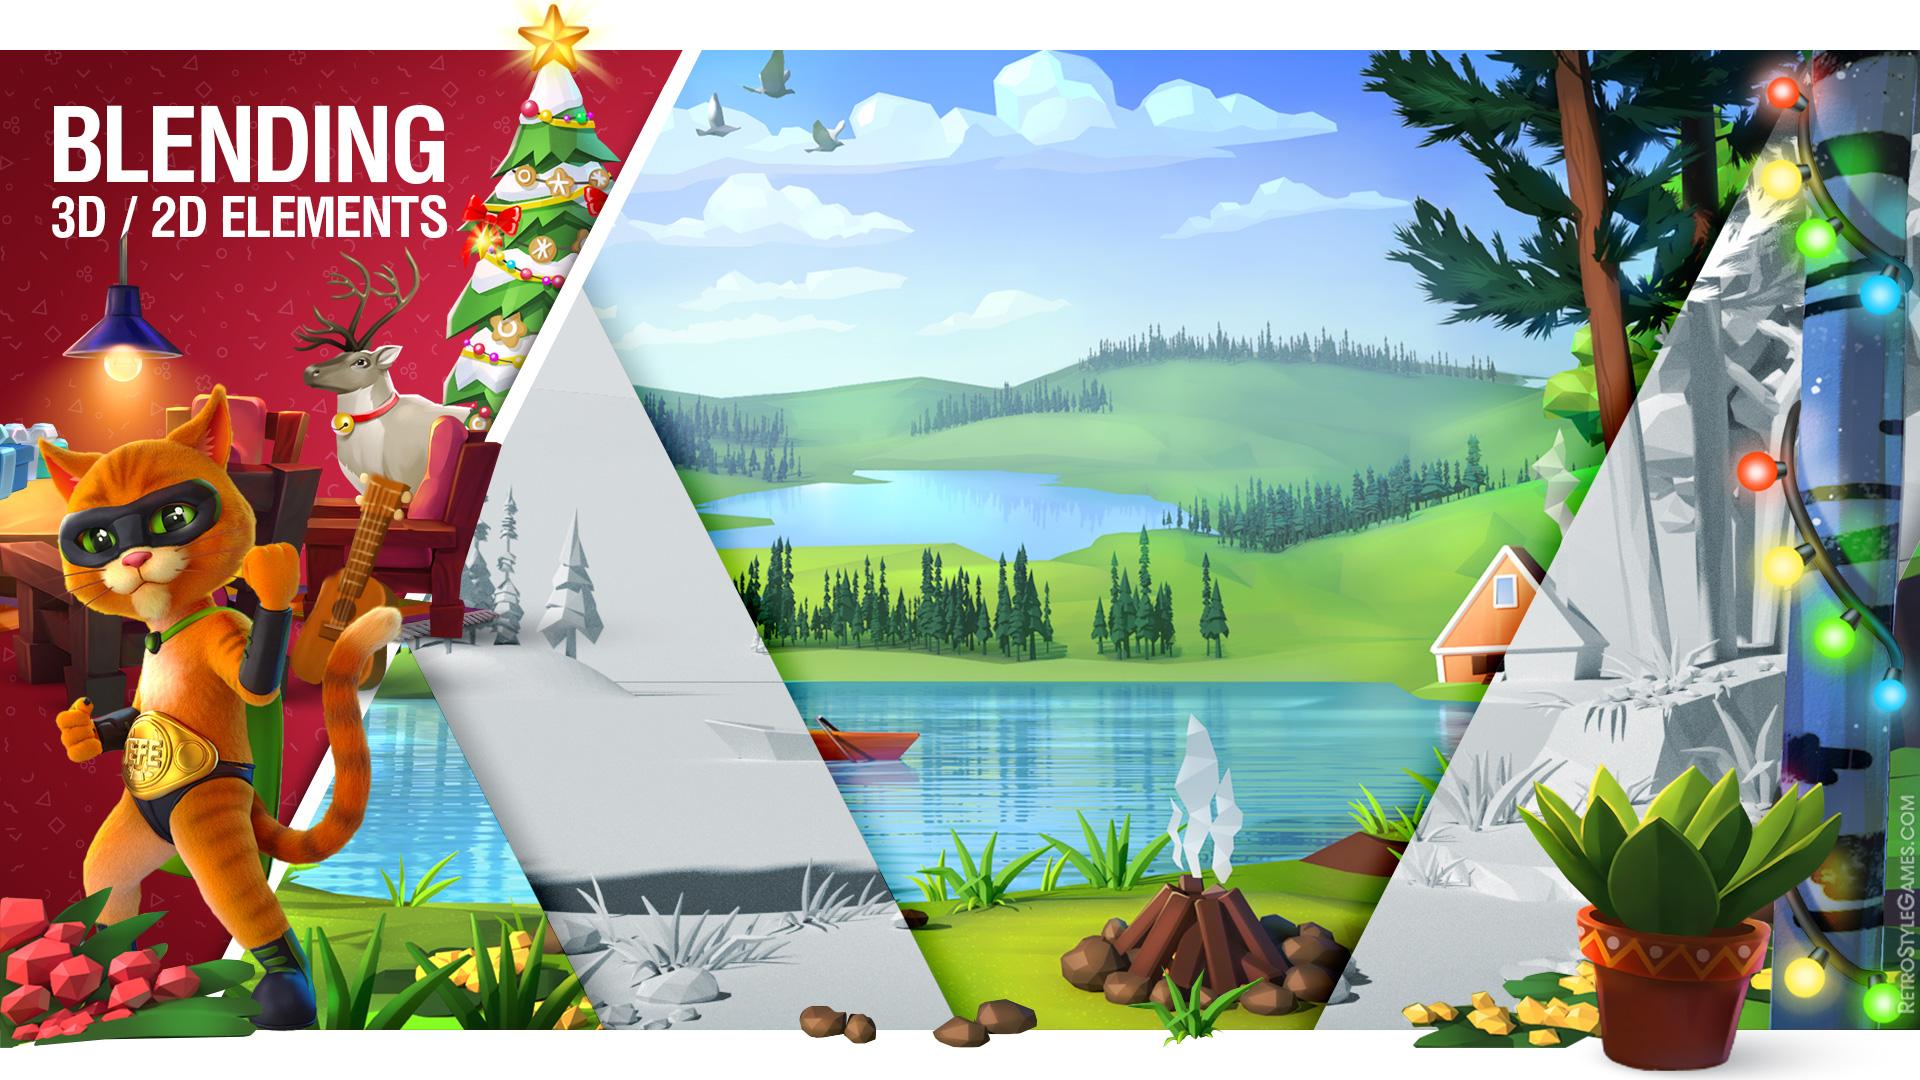 Blending 2D 3D Modeling Background Environment Concept Art